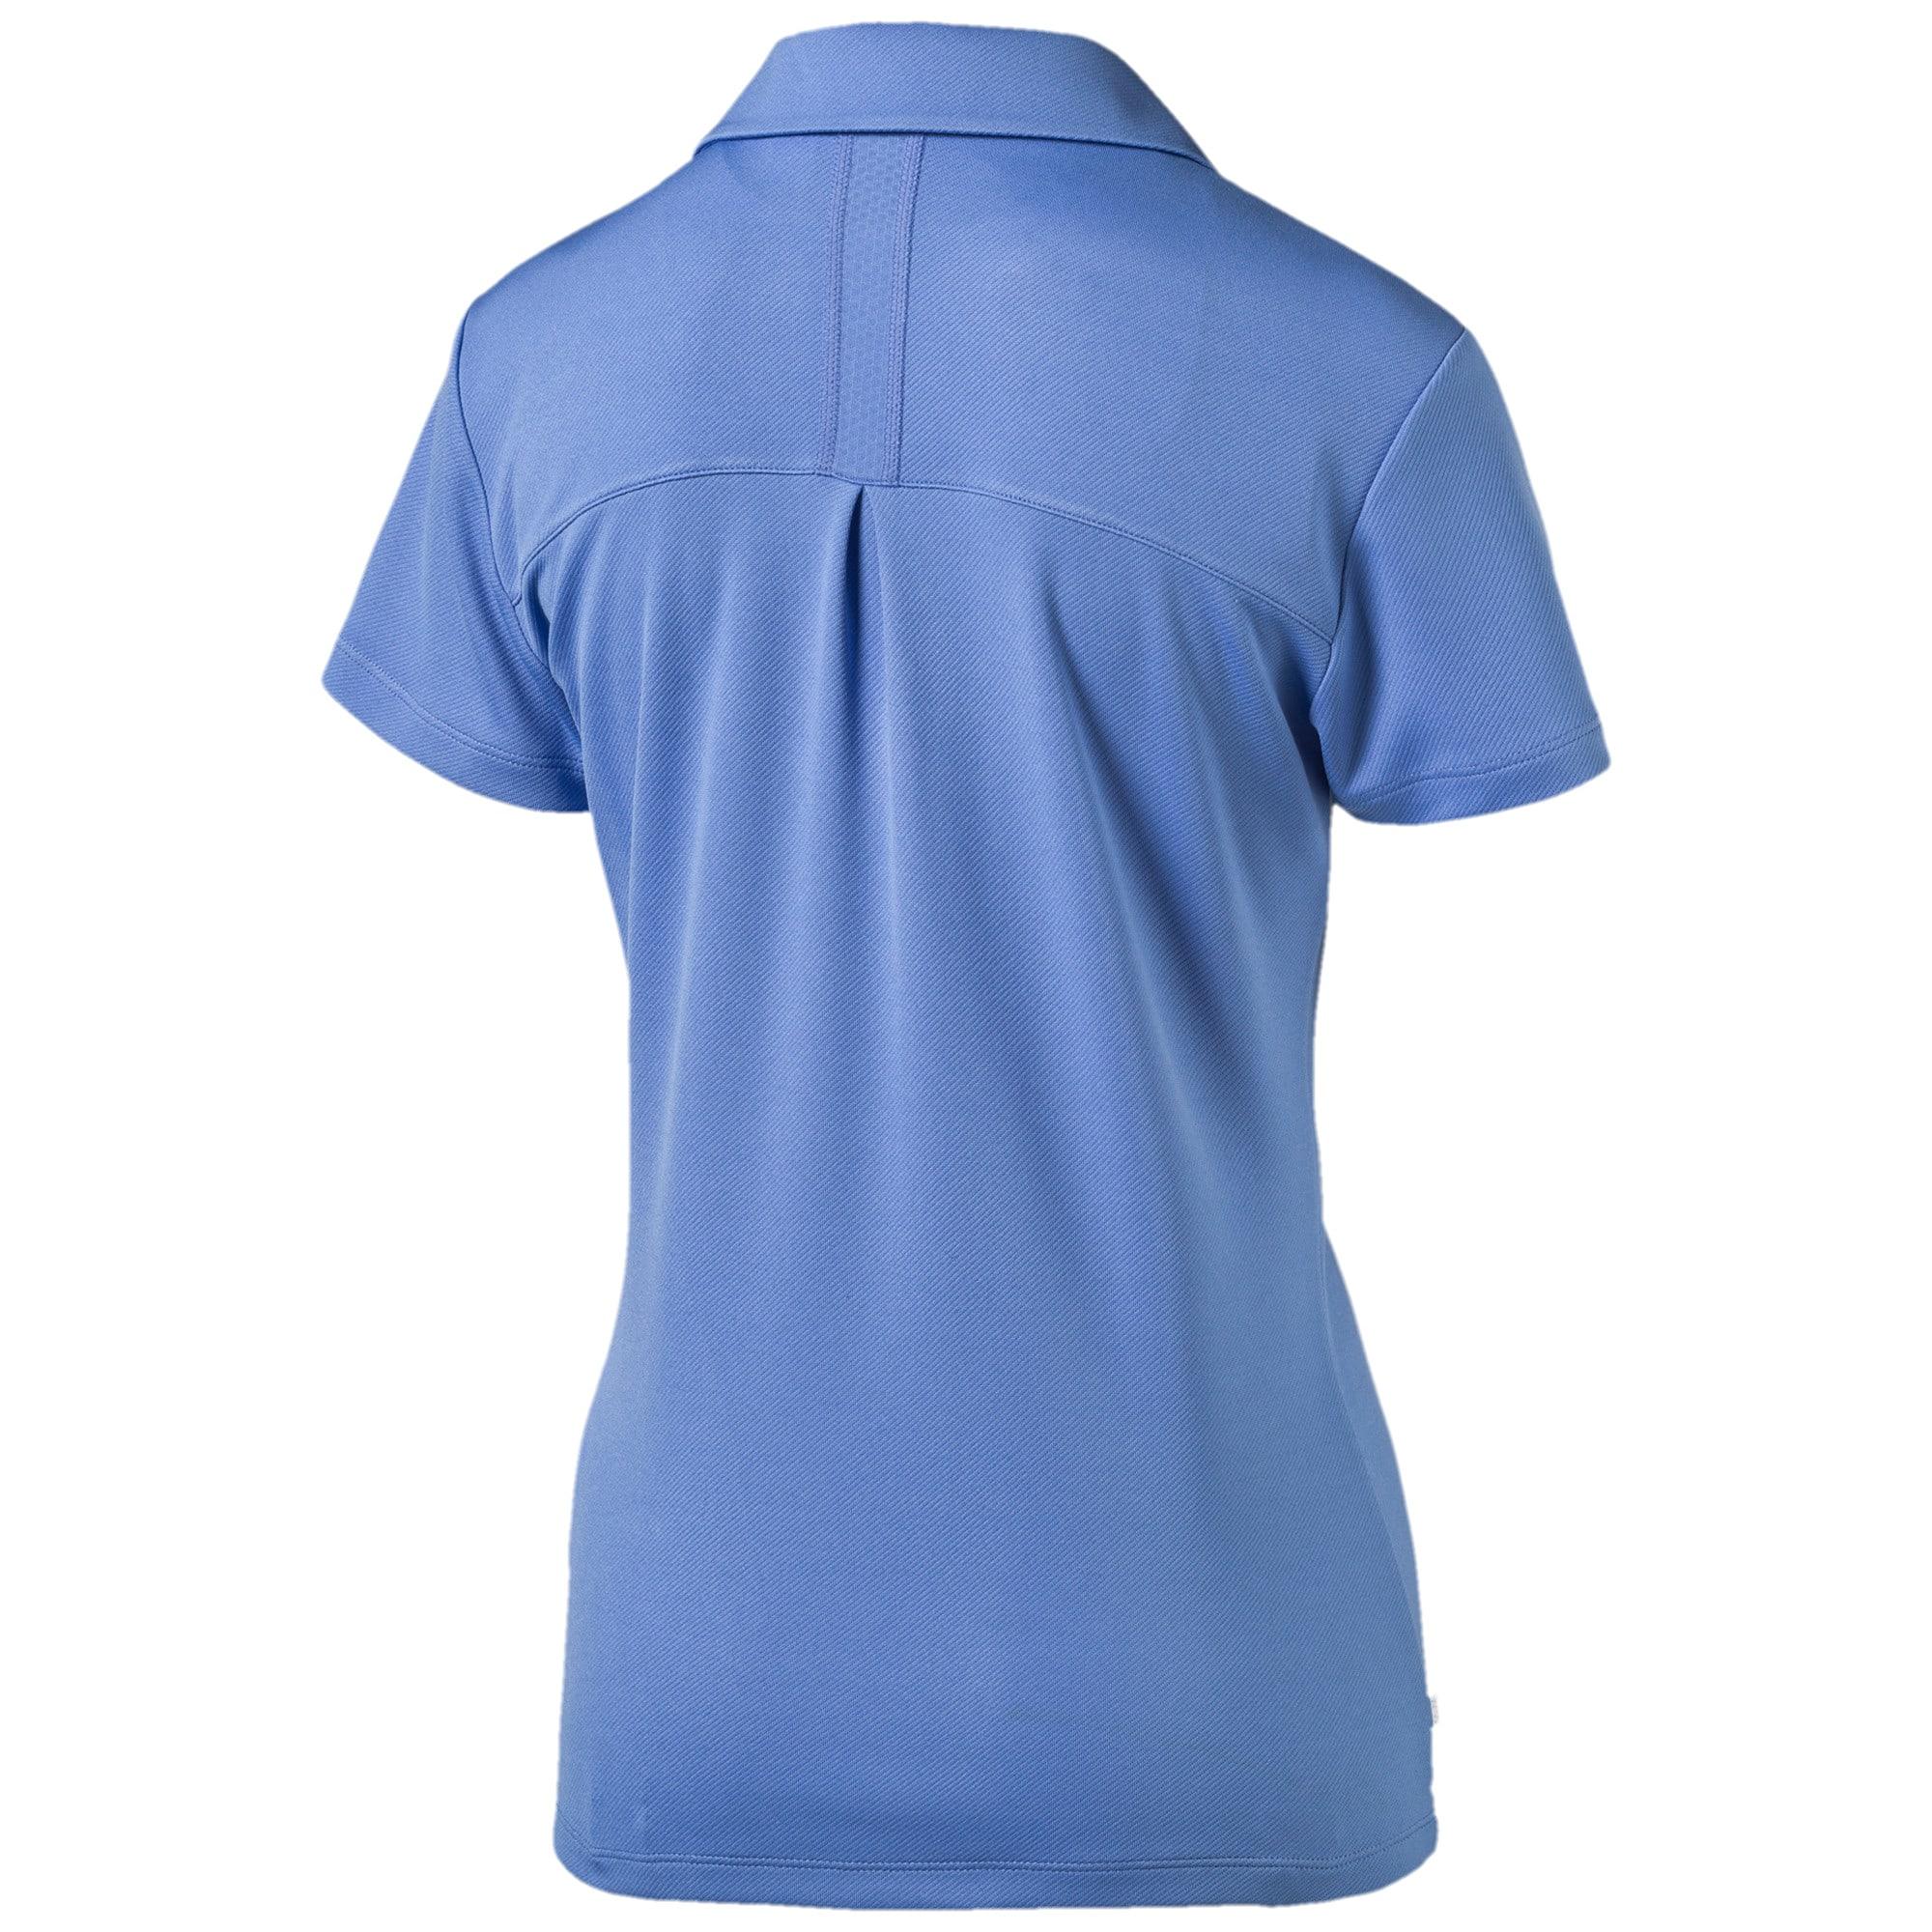 Thumbnail 2 of Golf Tech Polo, ultramarine, medium-IND